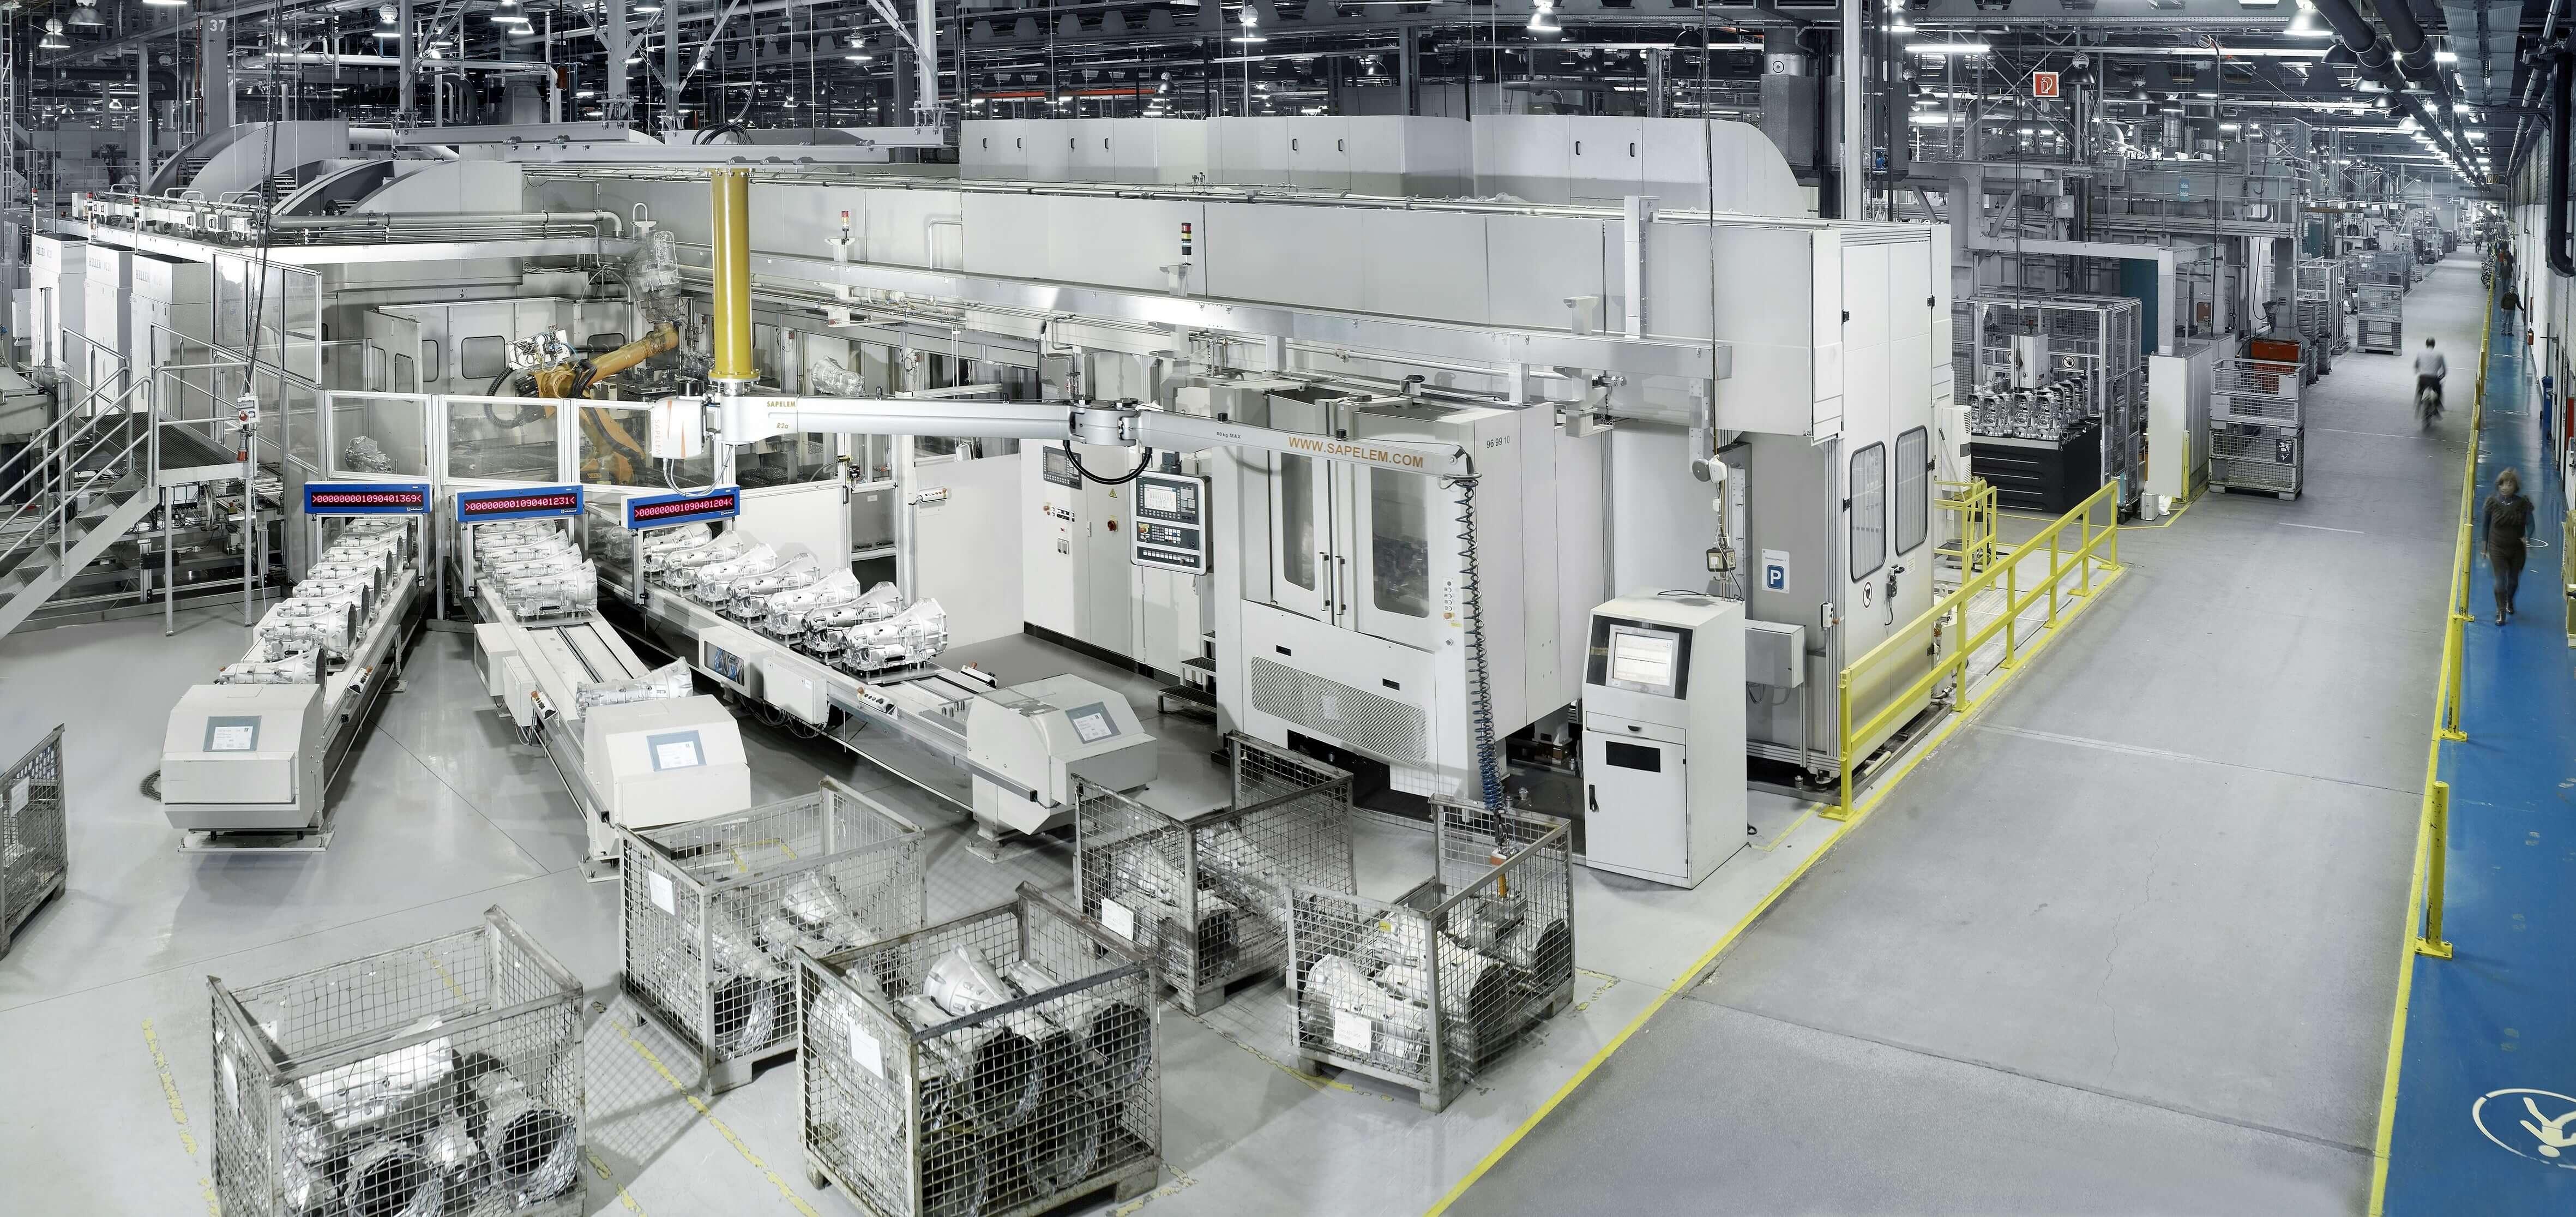 Heller4Industry Manufacturing System, Quelle: Heller